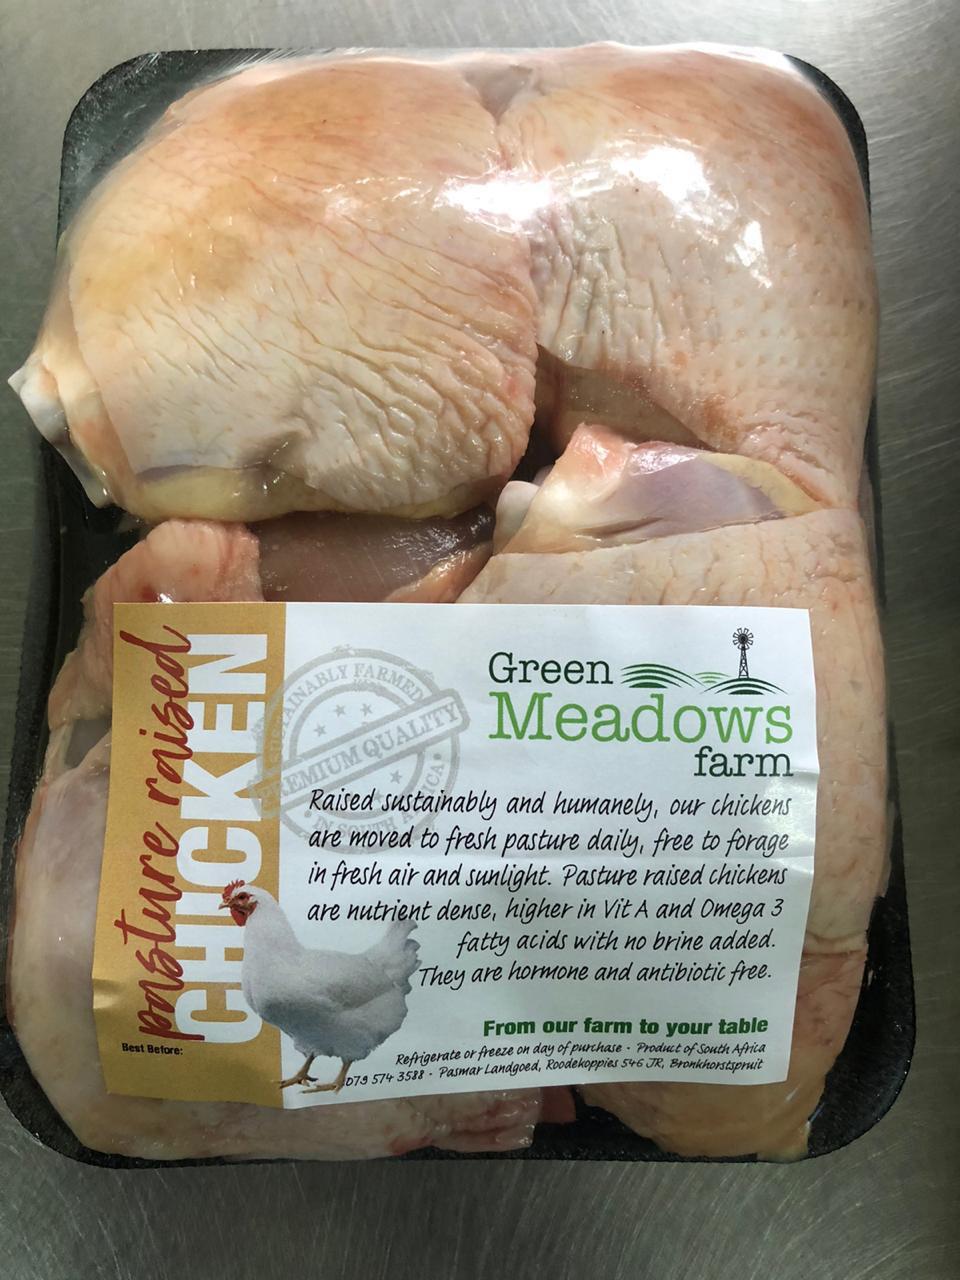 Free Range Chicken Thighs (R85 per kg) 4 per pack average packs is 500g